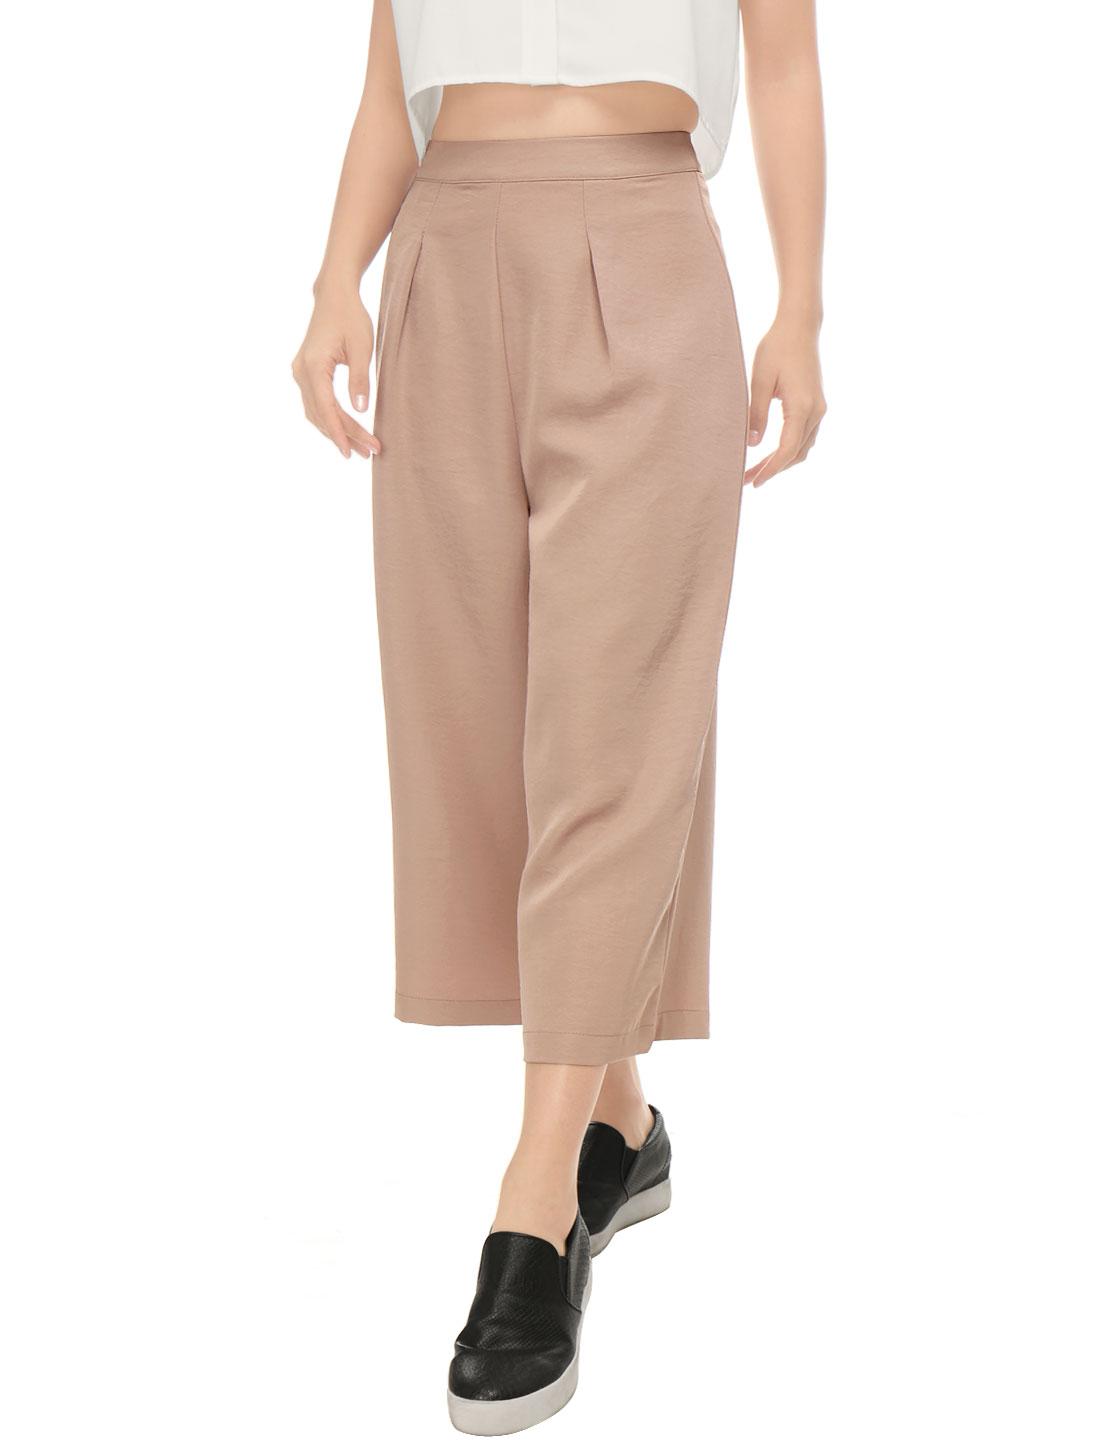 Women Concealed Zipper Side Loose Capris Culottes Pink L